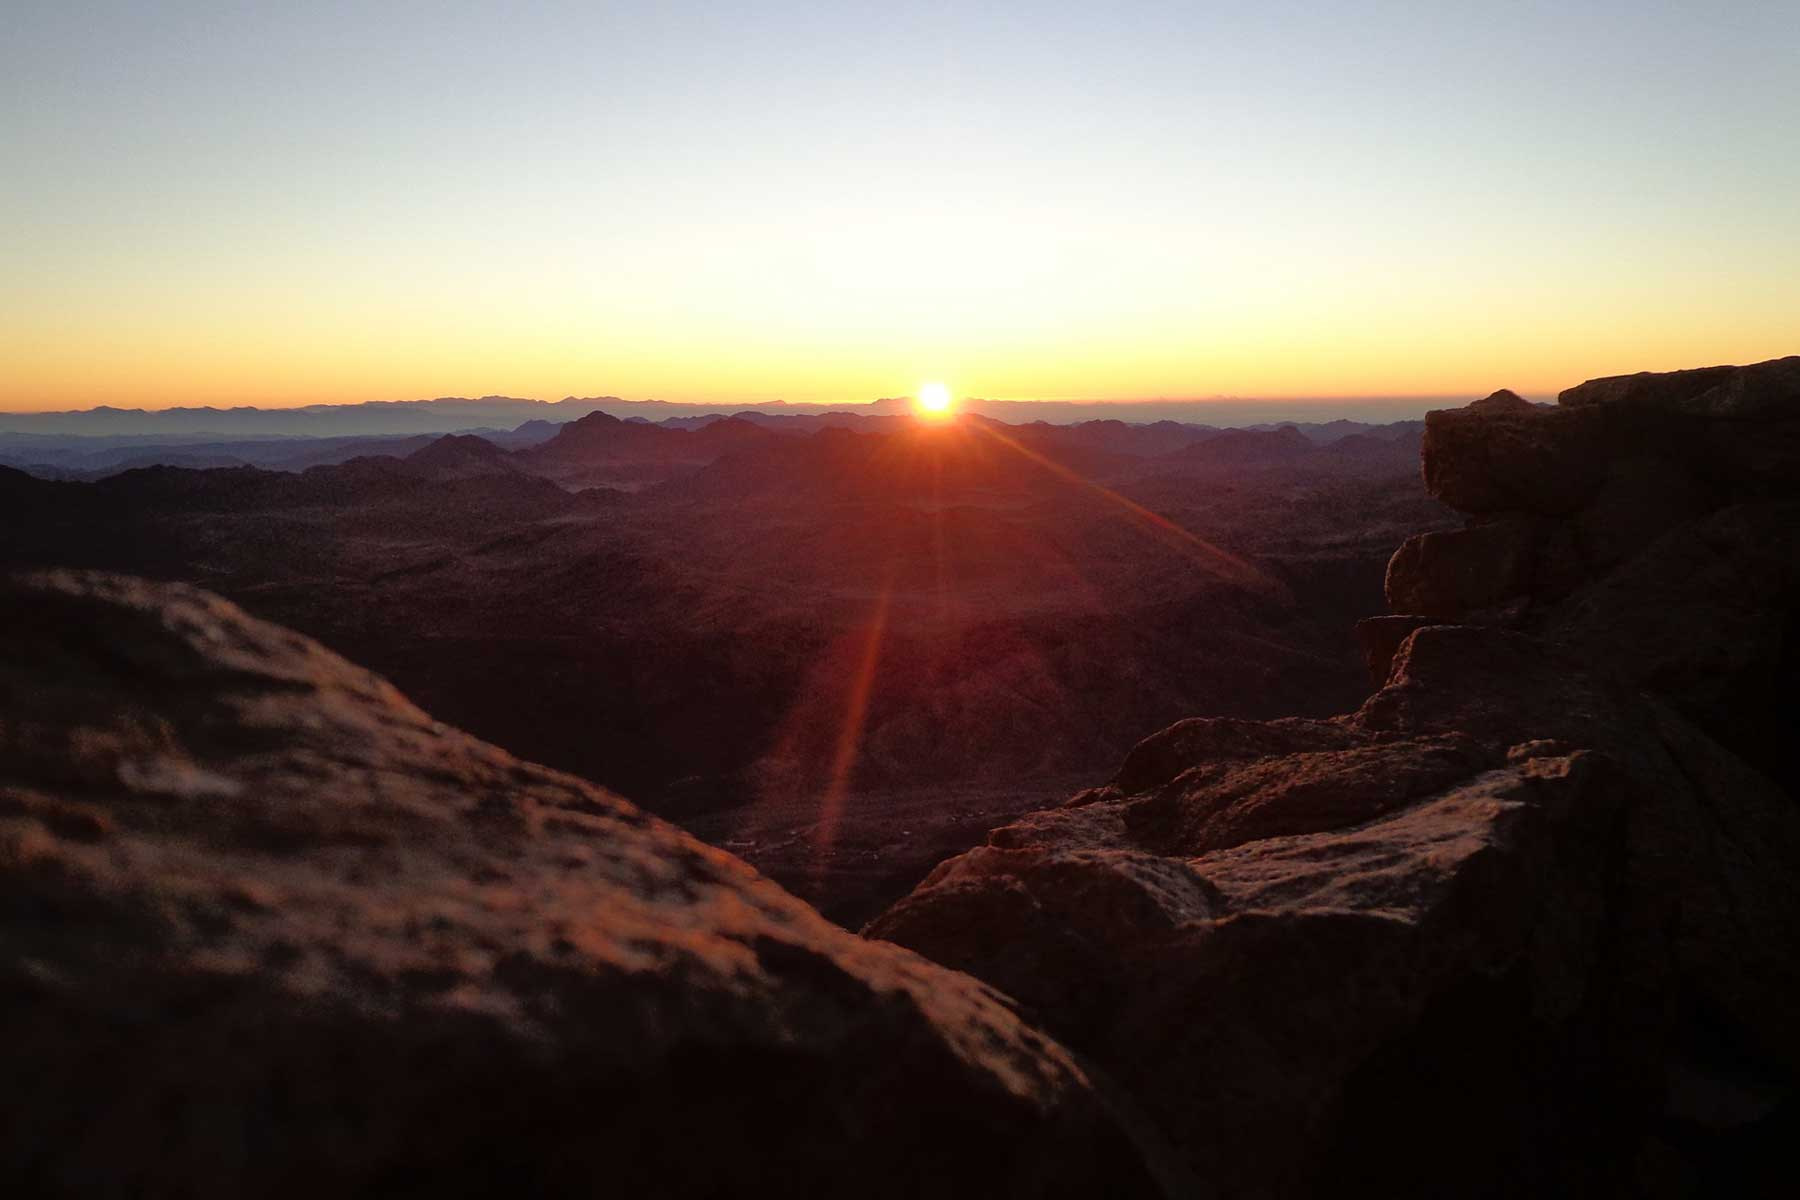 Mount Sinai Sunrise hike